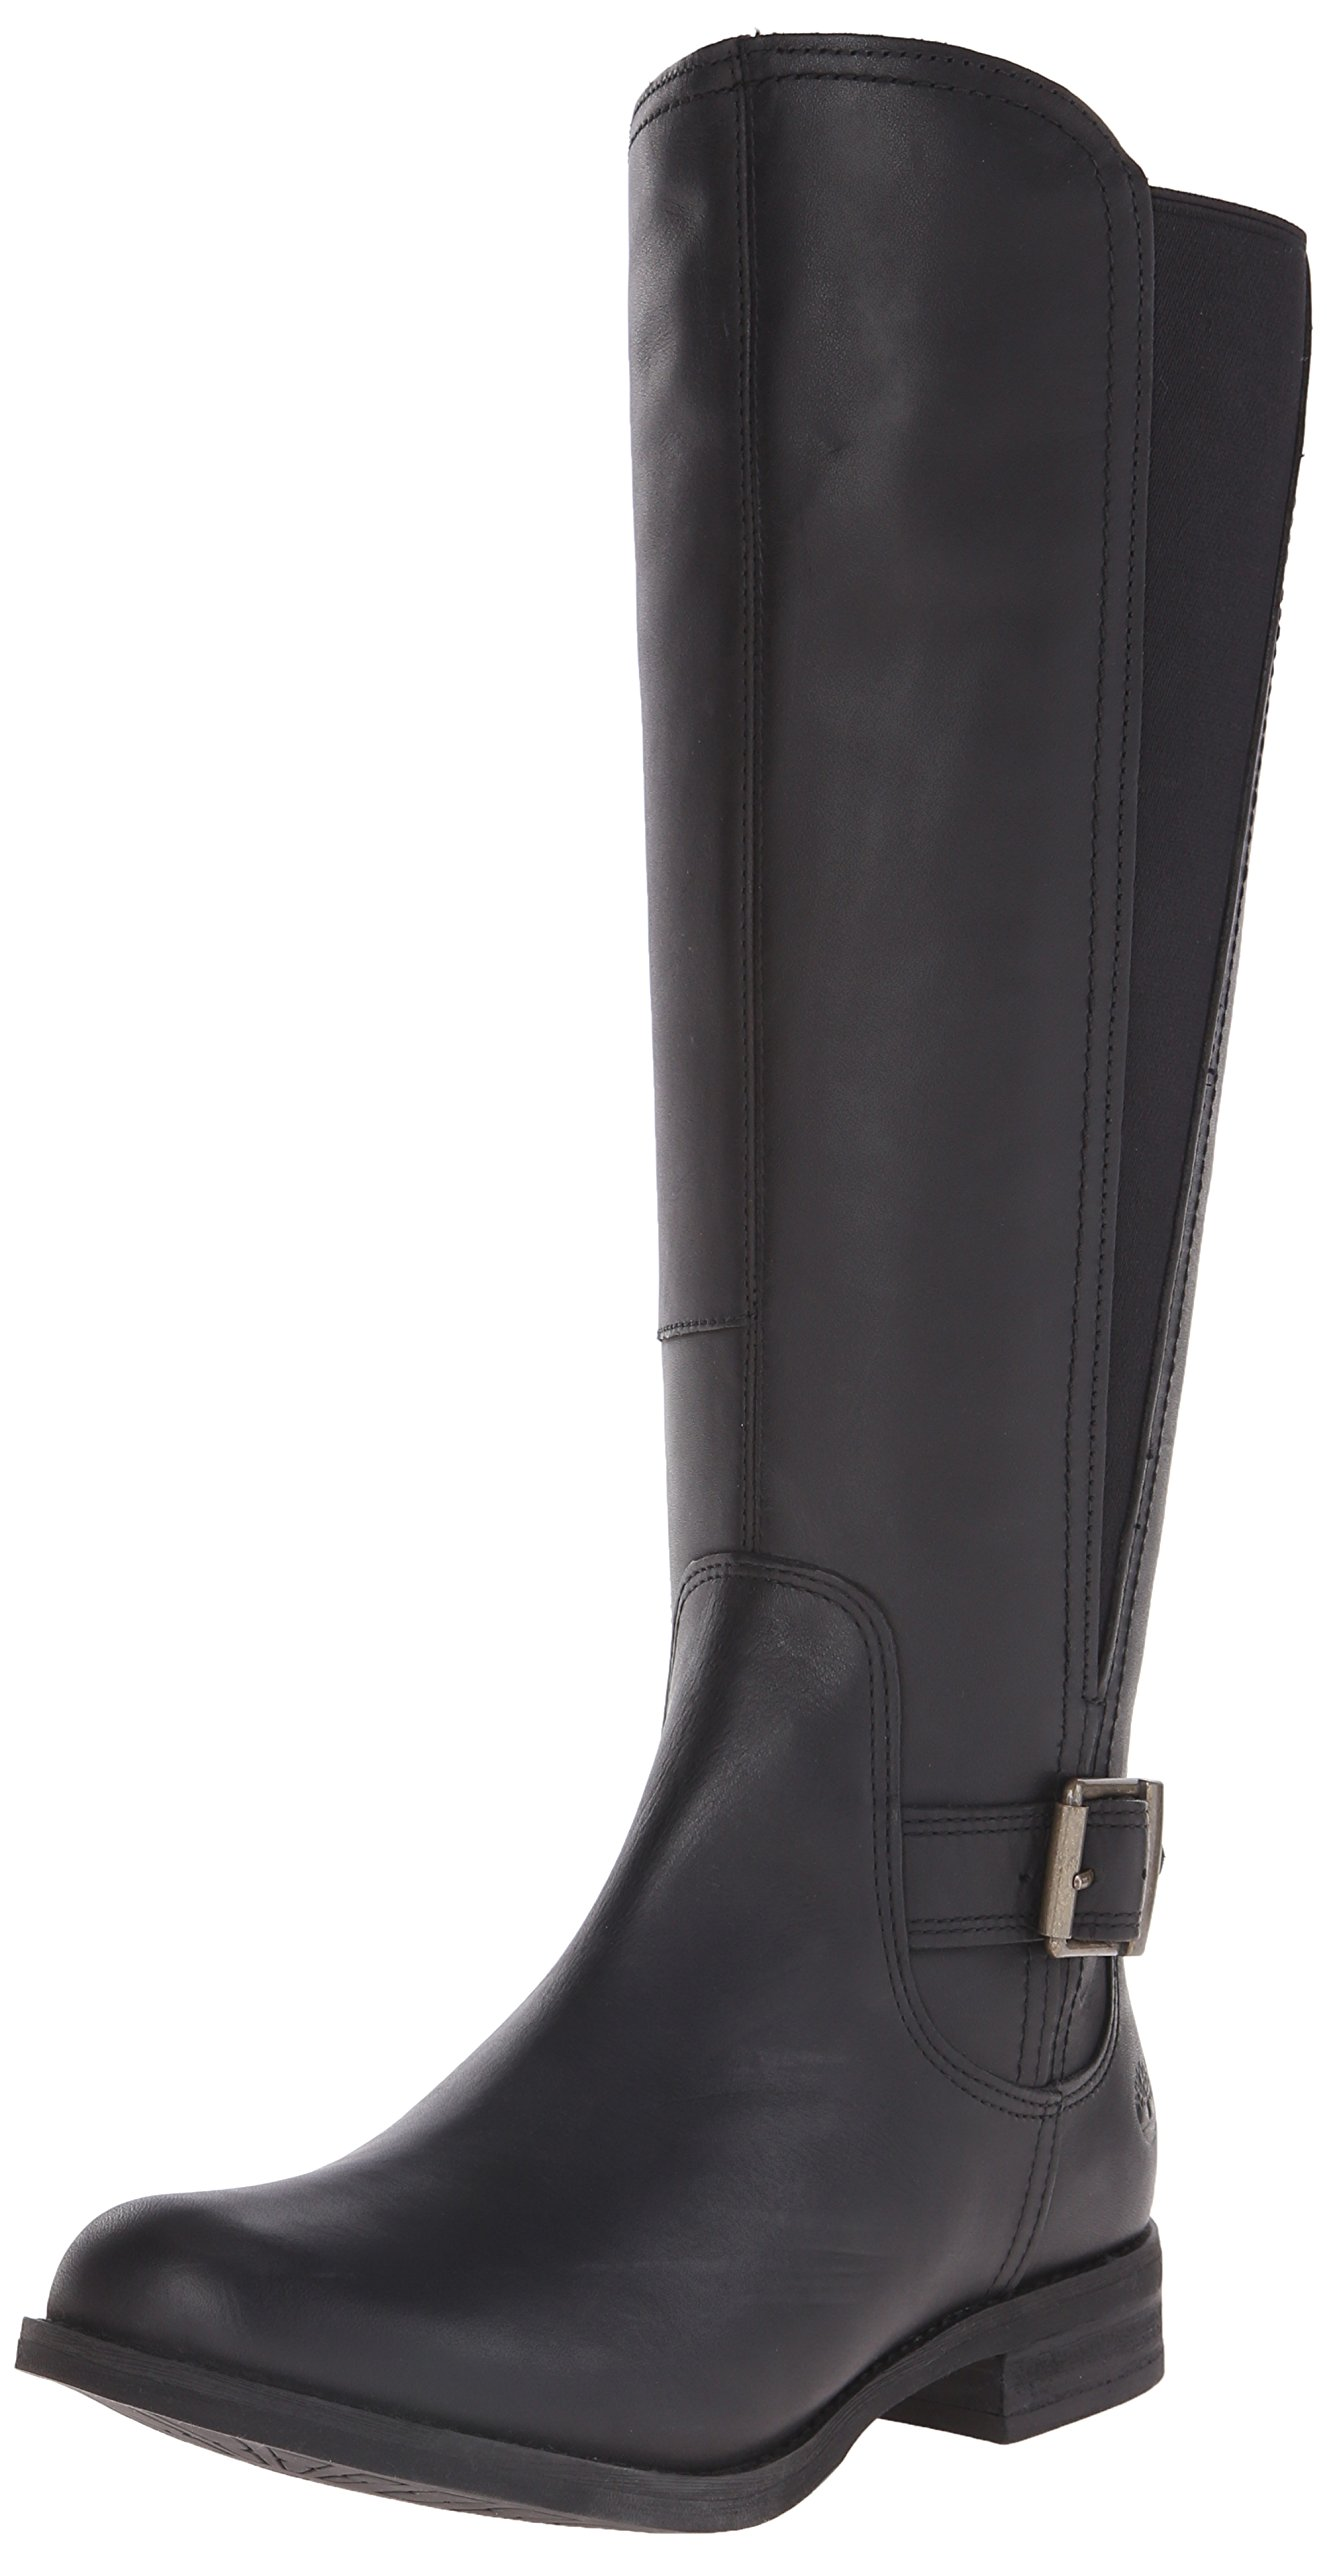 Timberland Women's Savin Hill Medium Shaft Tall Boot, Black Smooth, 8 M US